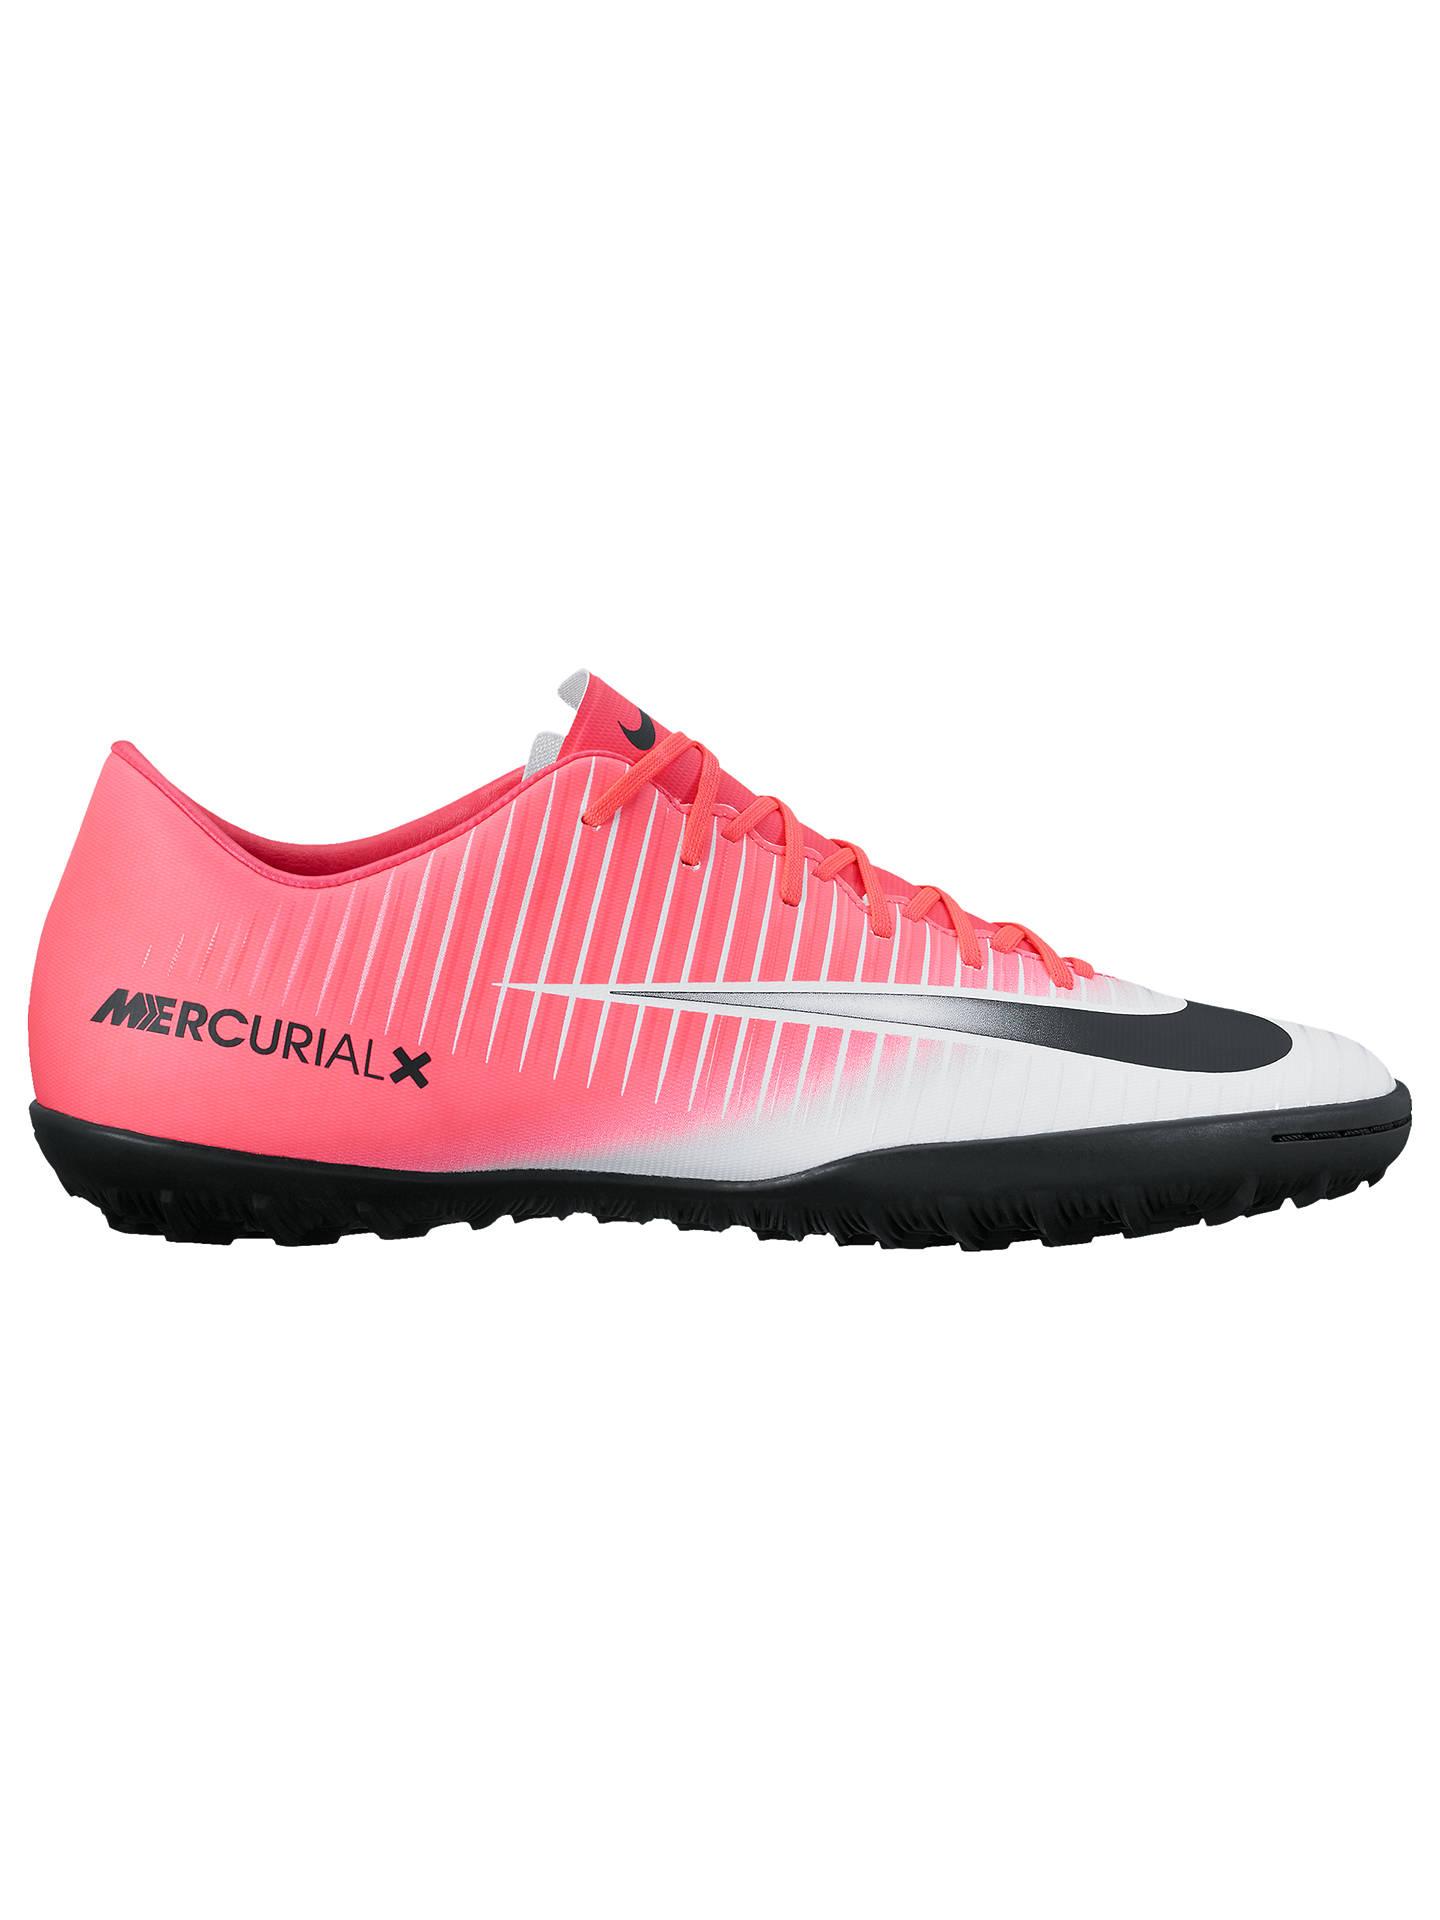 low cost 0c849 6f95d Nike MercurialX Victory VI Men's Turf Football Boots, Pink ...